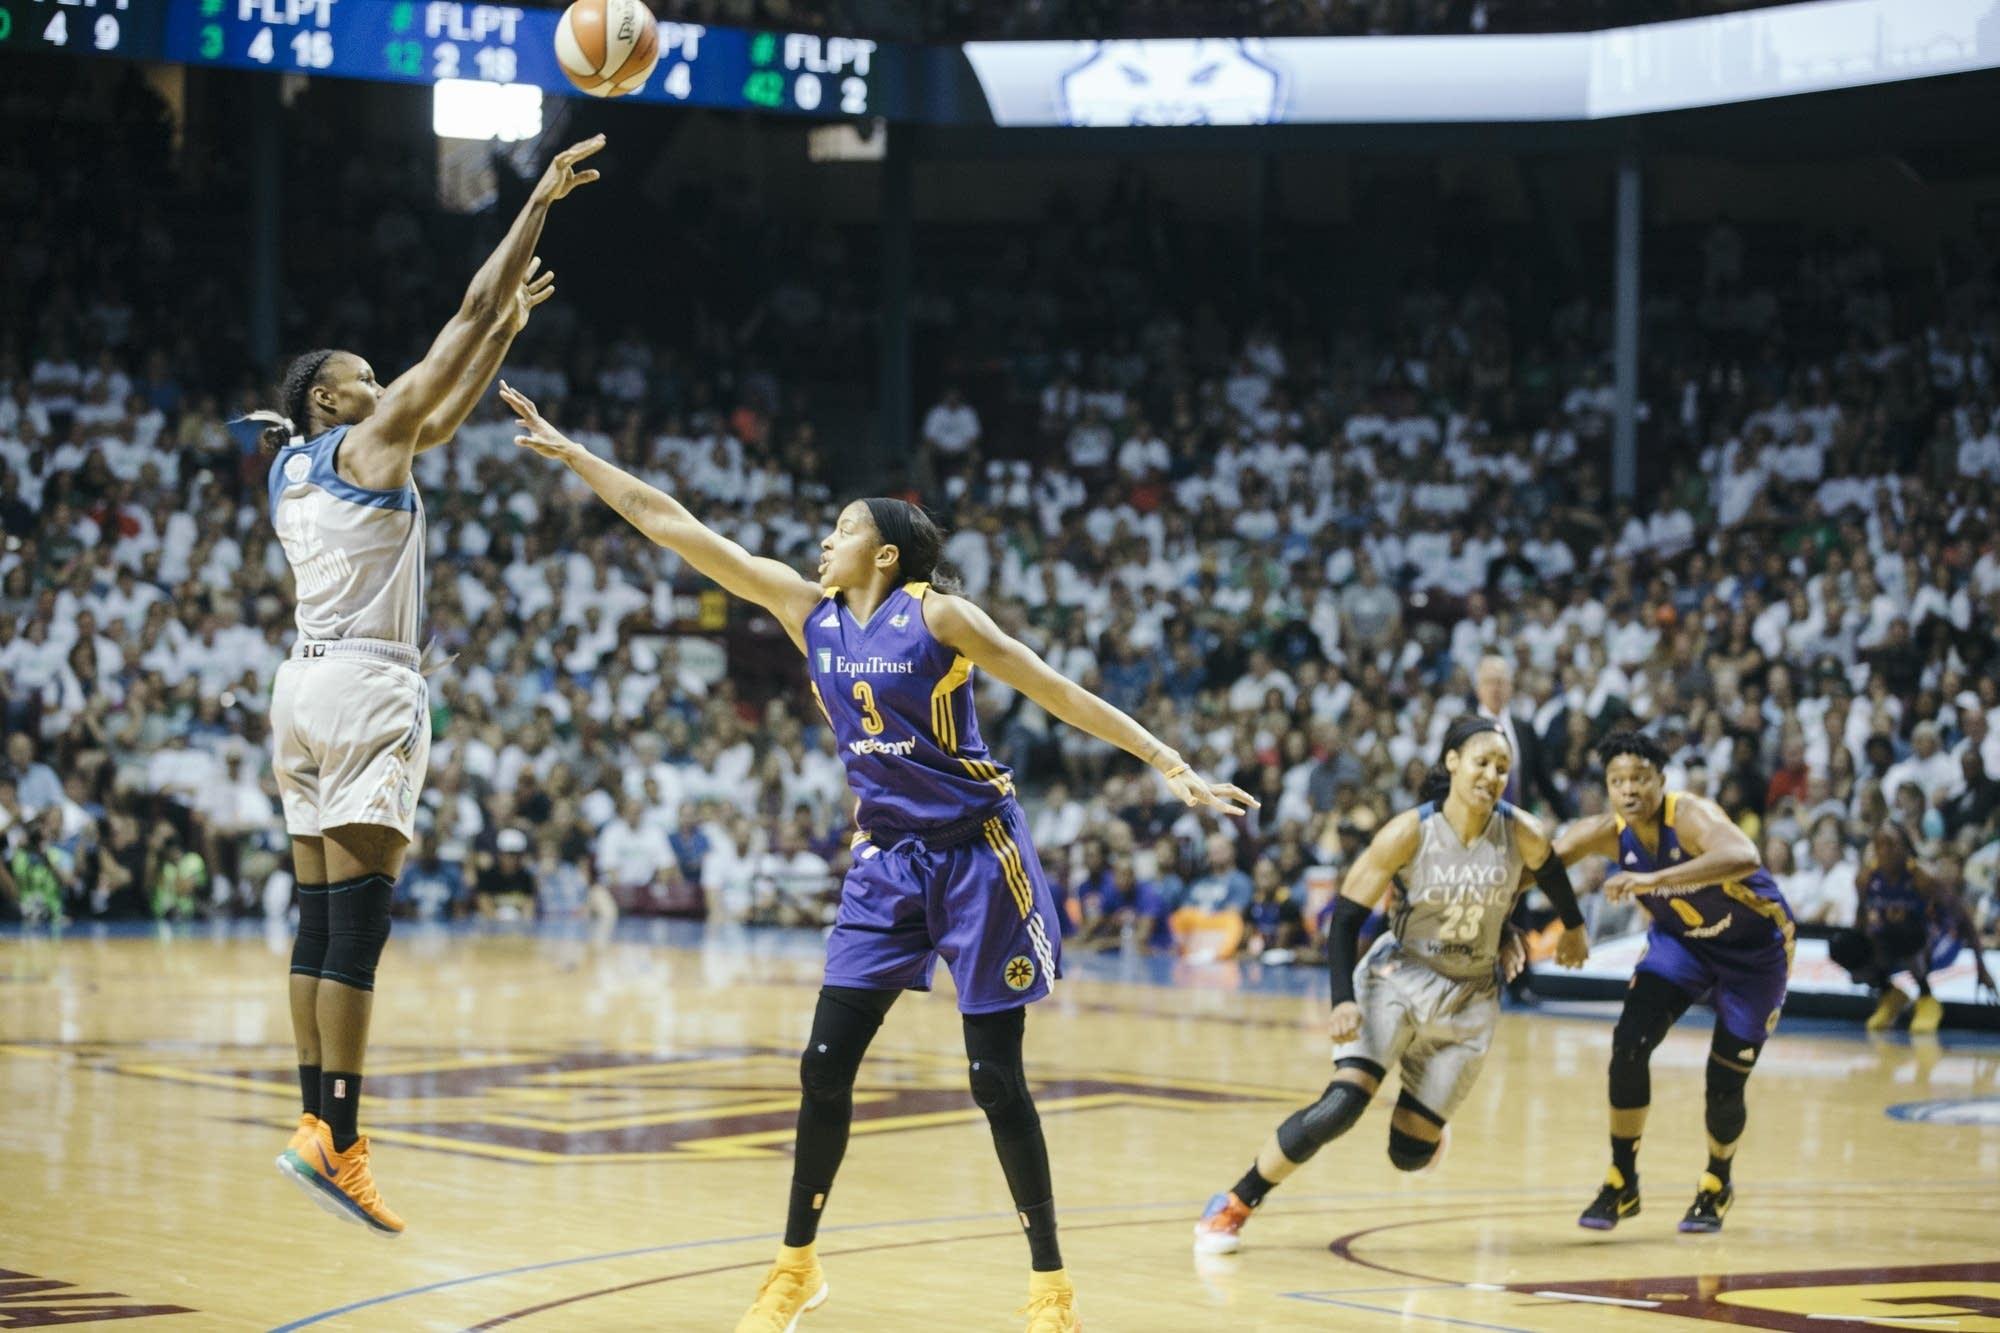 Lynx forward Rebekkah Brunson shoots a 3-pointer.